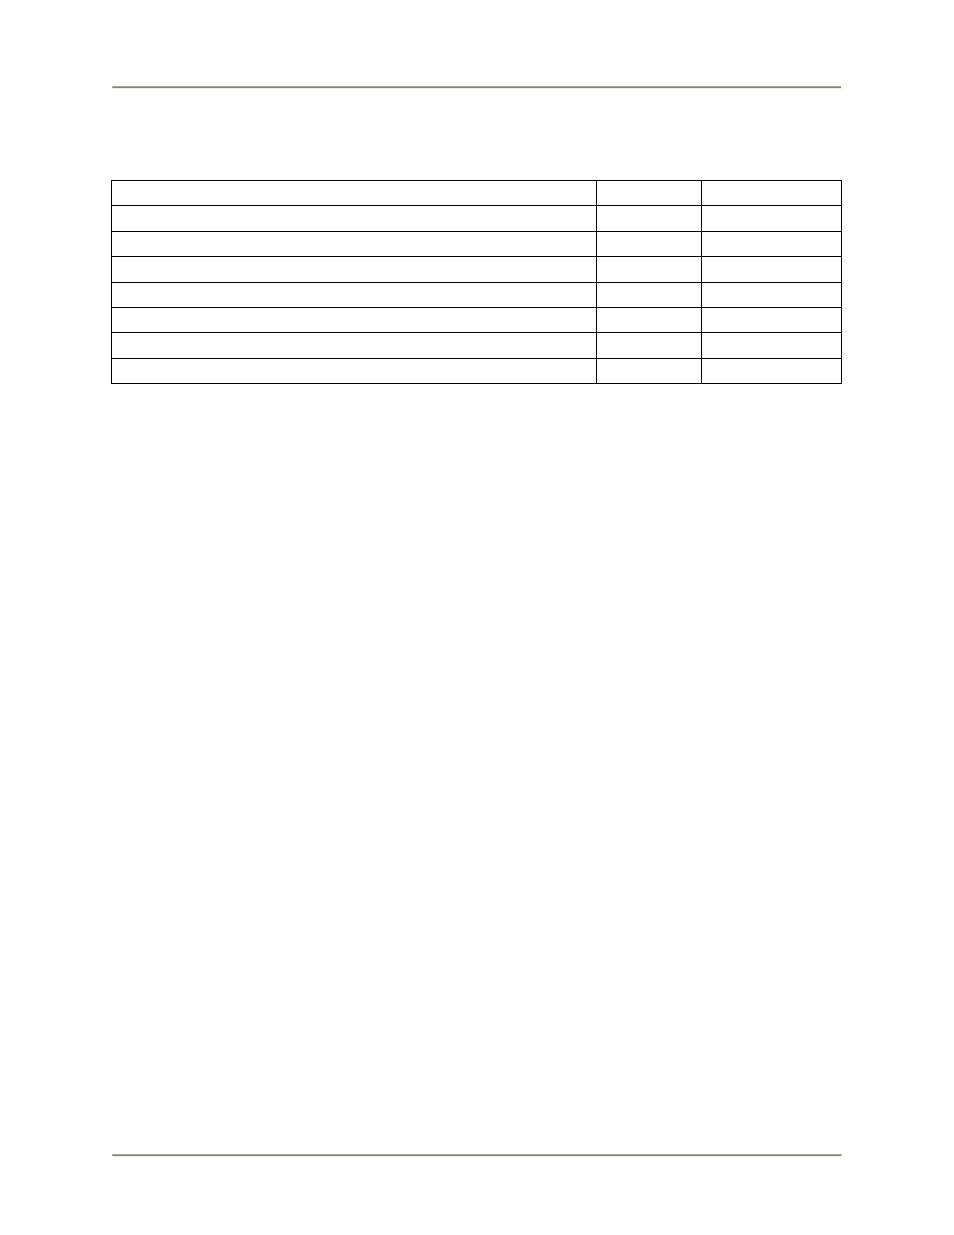 hight resolution of 240v 3 phase wiring diagram